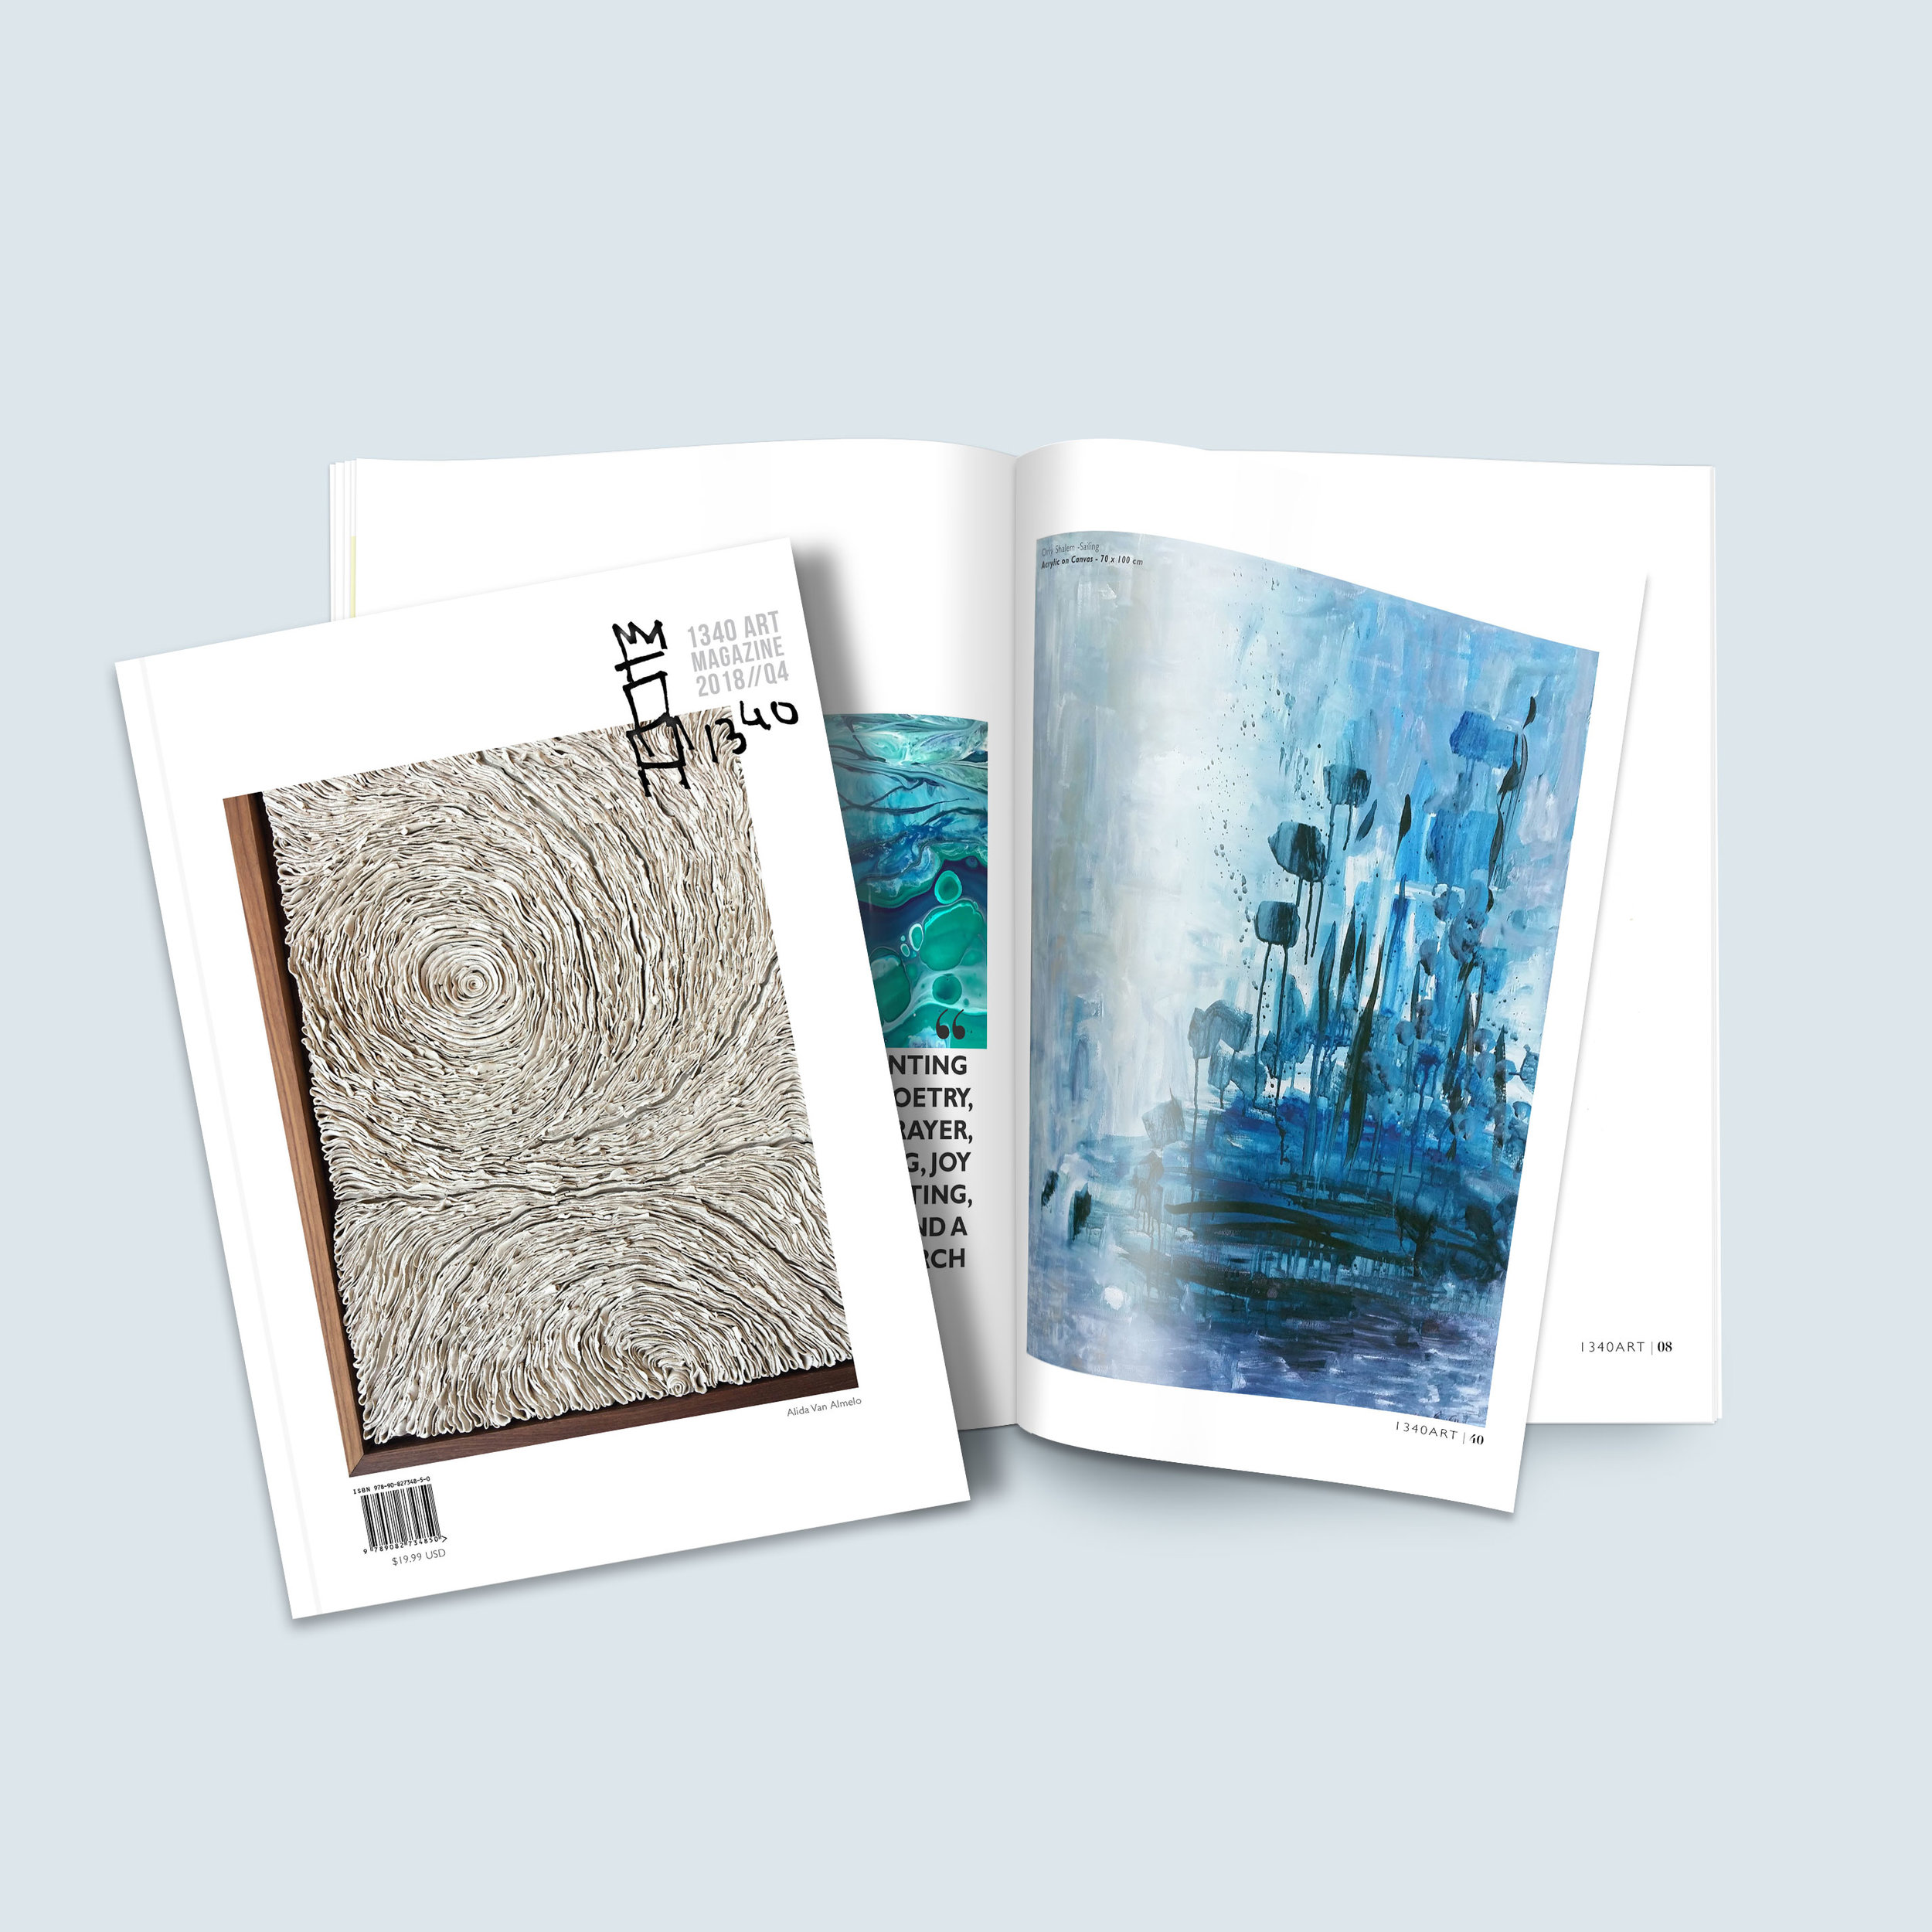 1340Art Magazine -